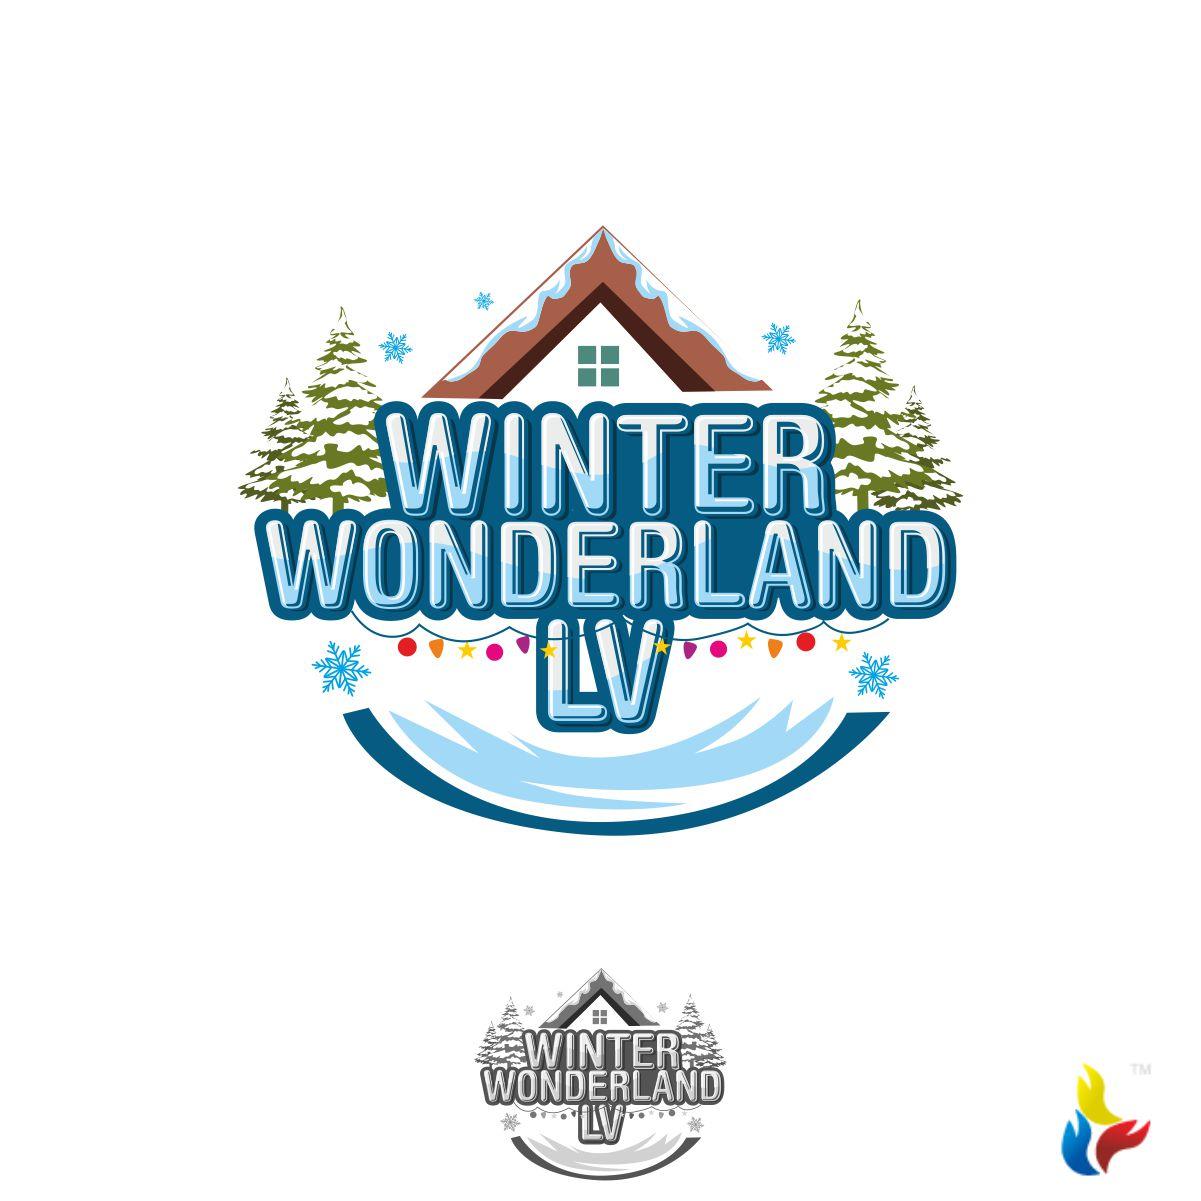 Playful Colorful Festival Logo Design For Winter